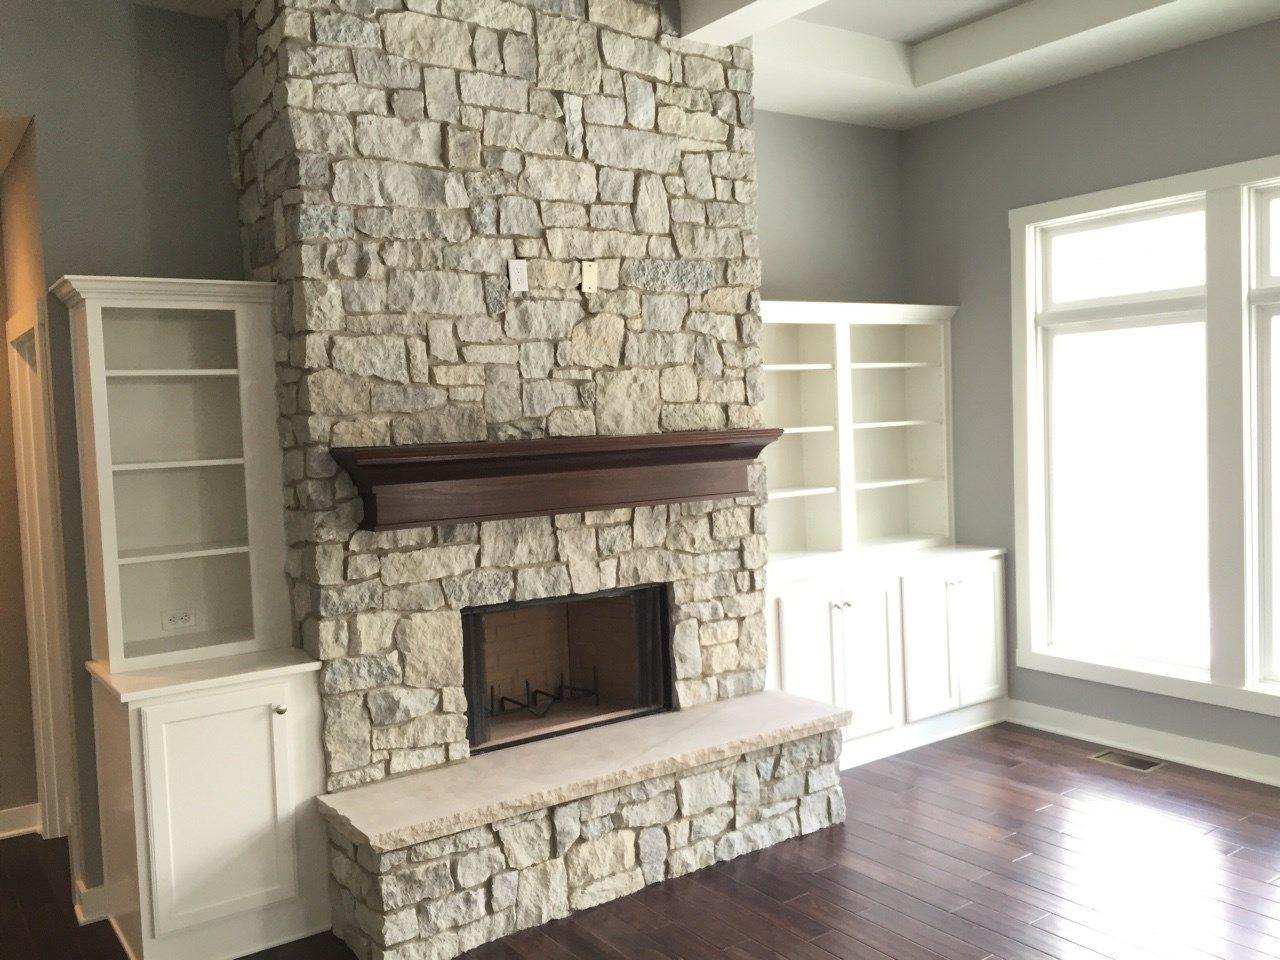 Asymmetrical Fireplace Built Ins Fireplace Built Ins Built In